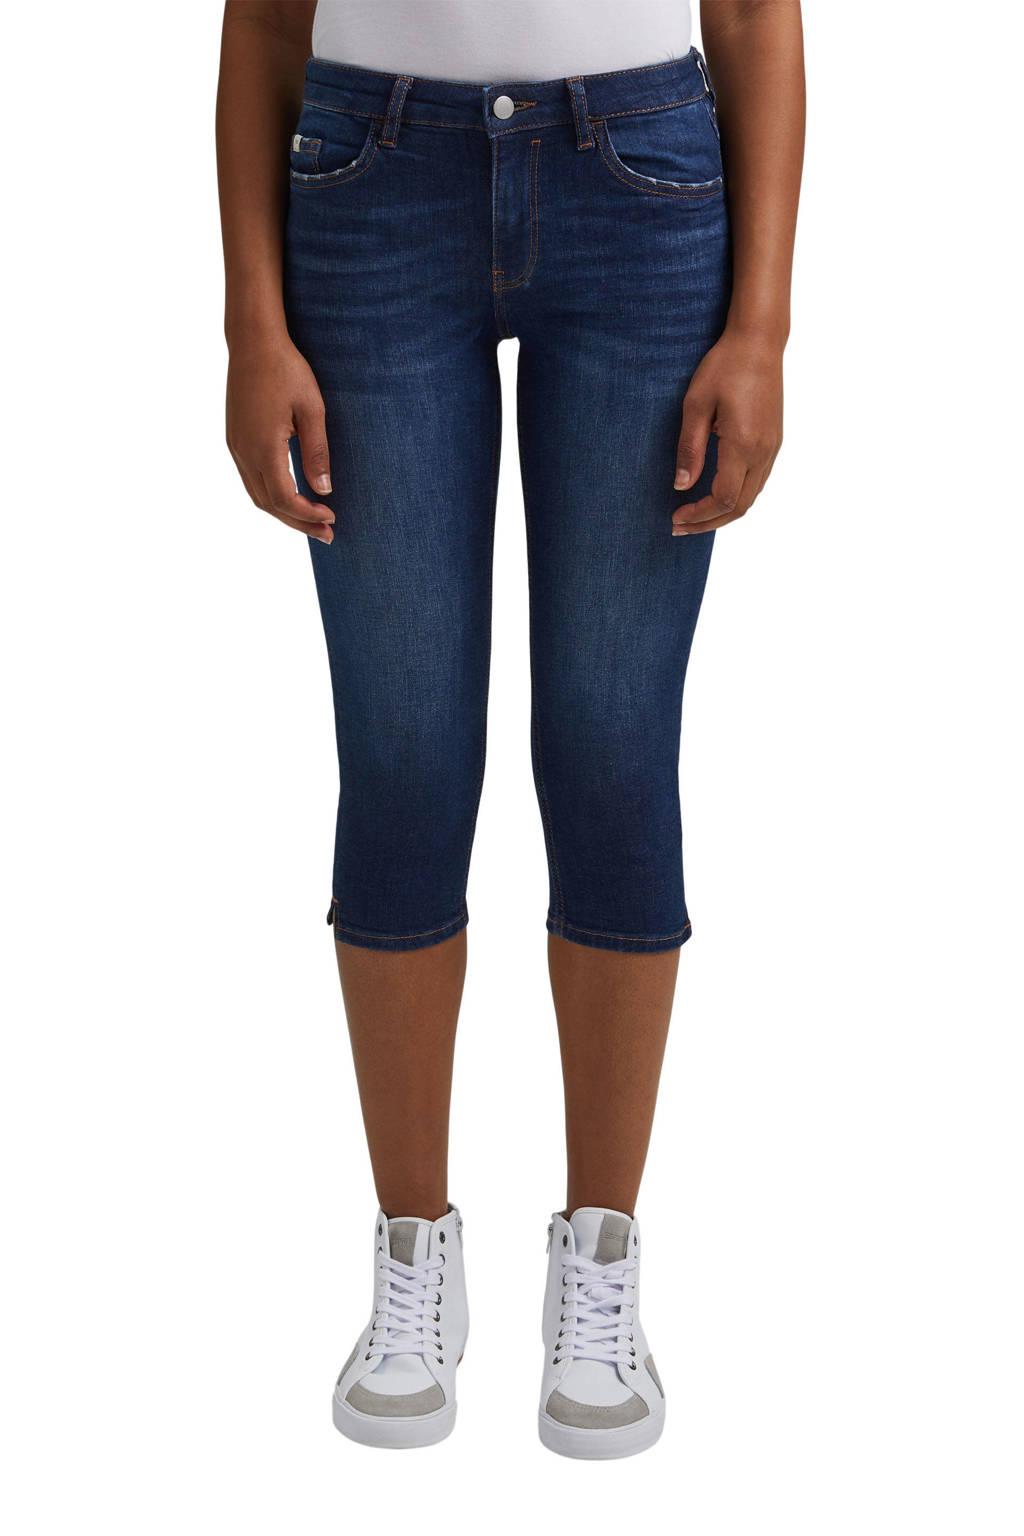 edc Women skinny capri met biologisch katoen donkerblauw, Donkerblauw